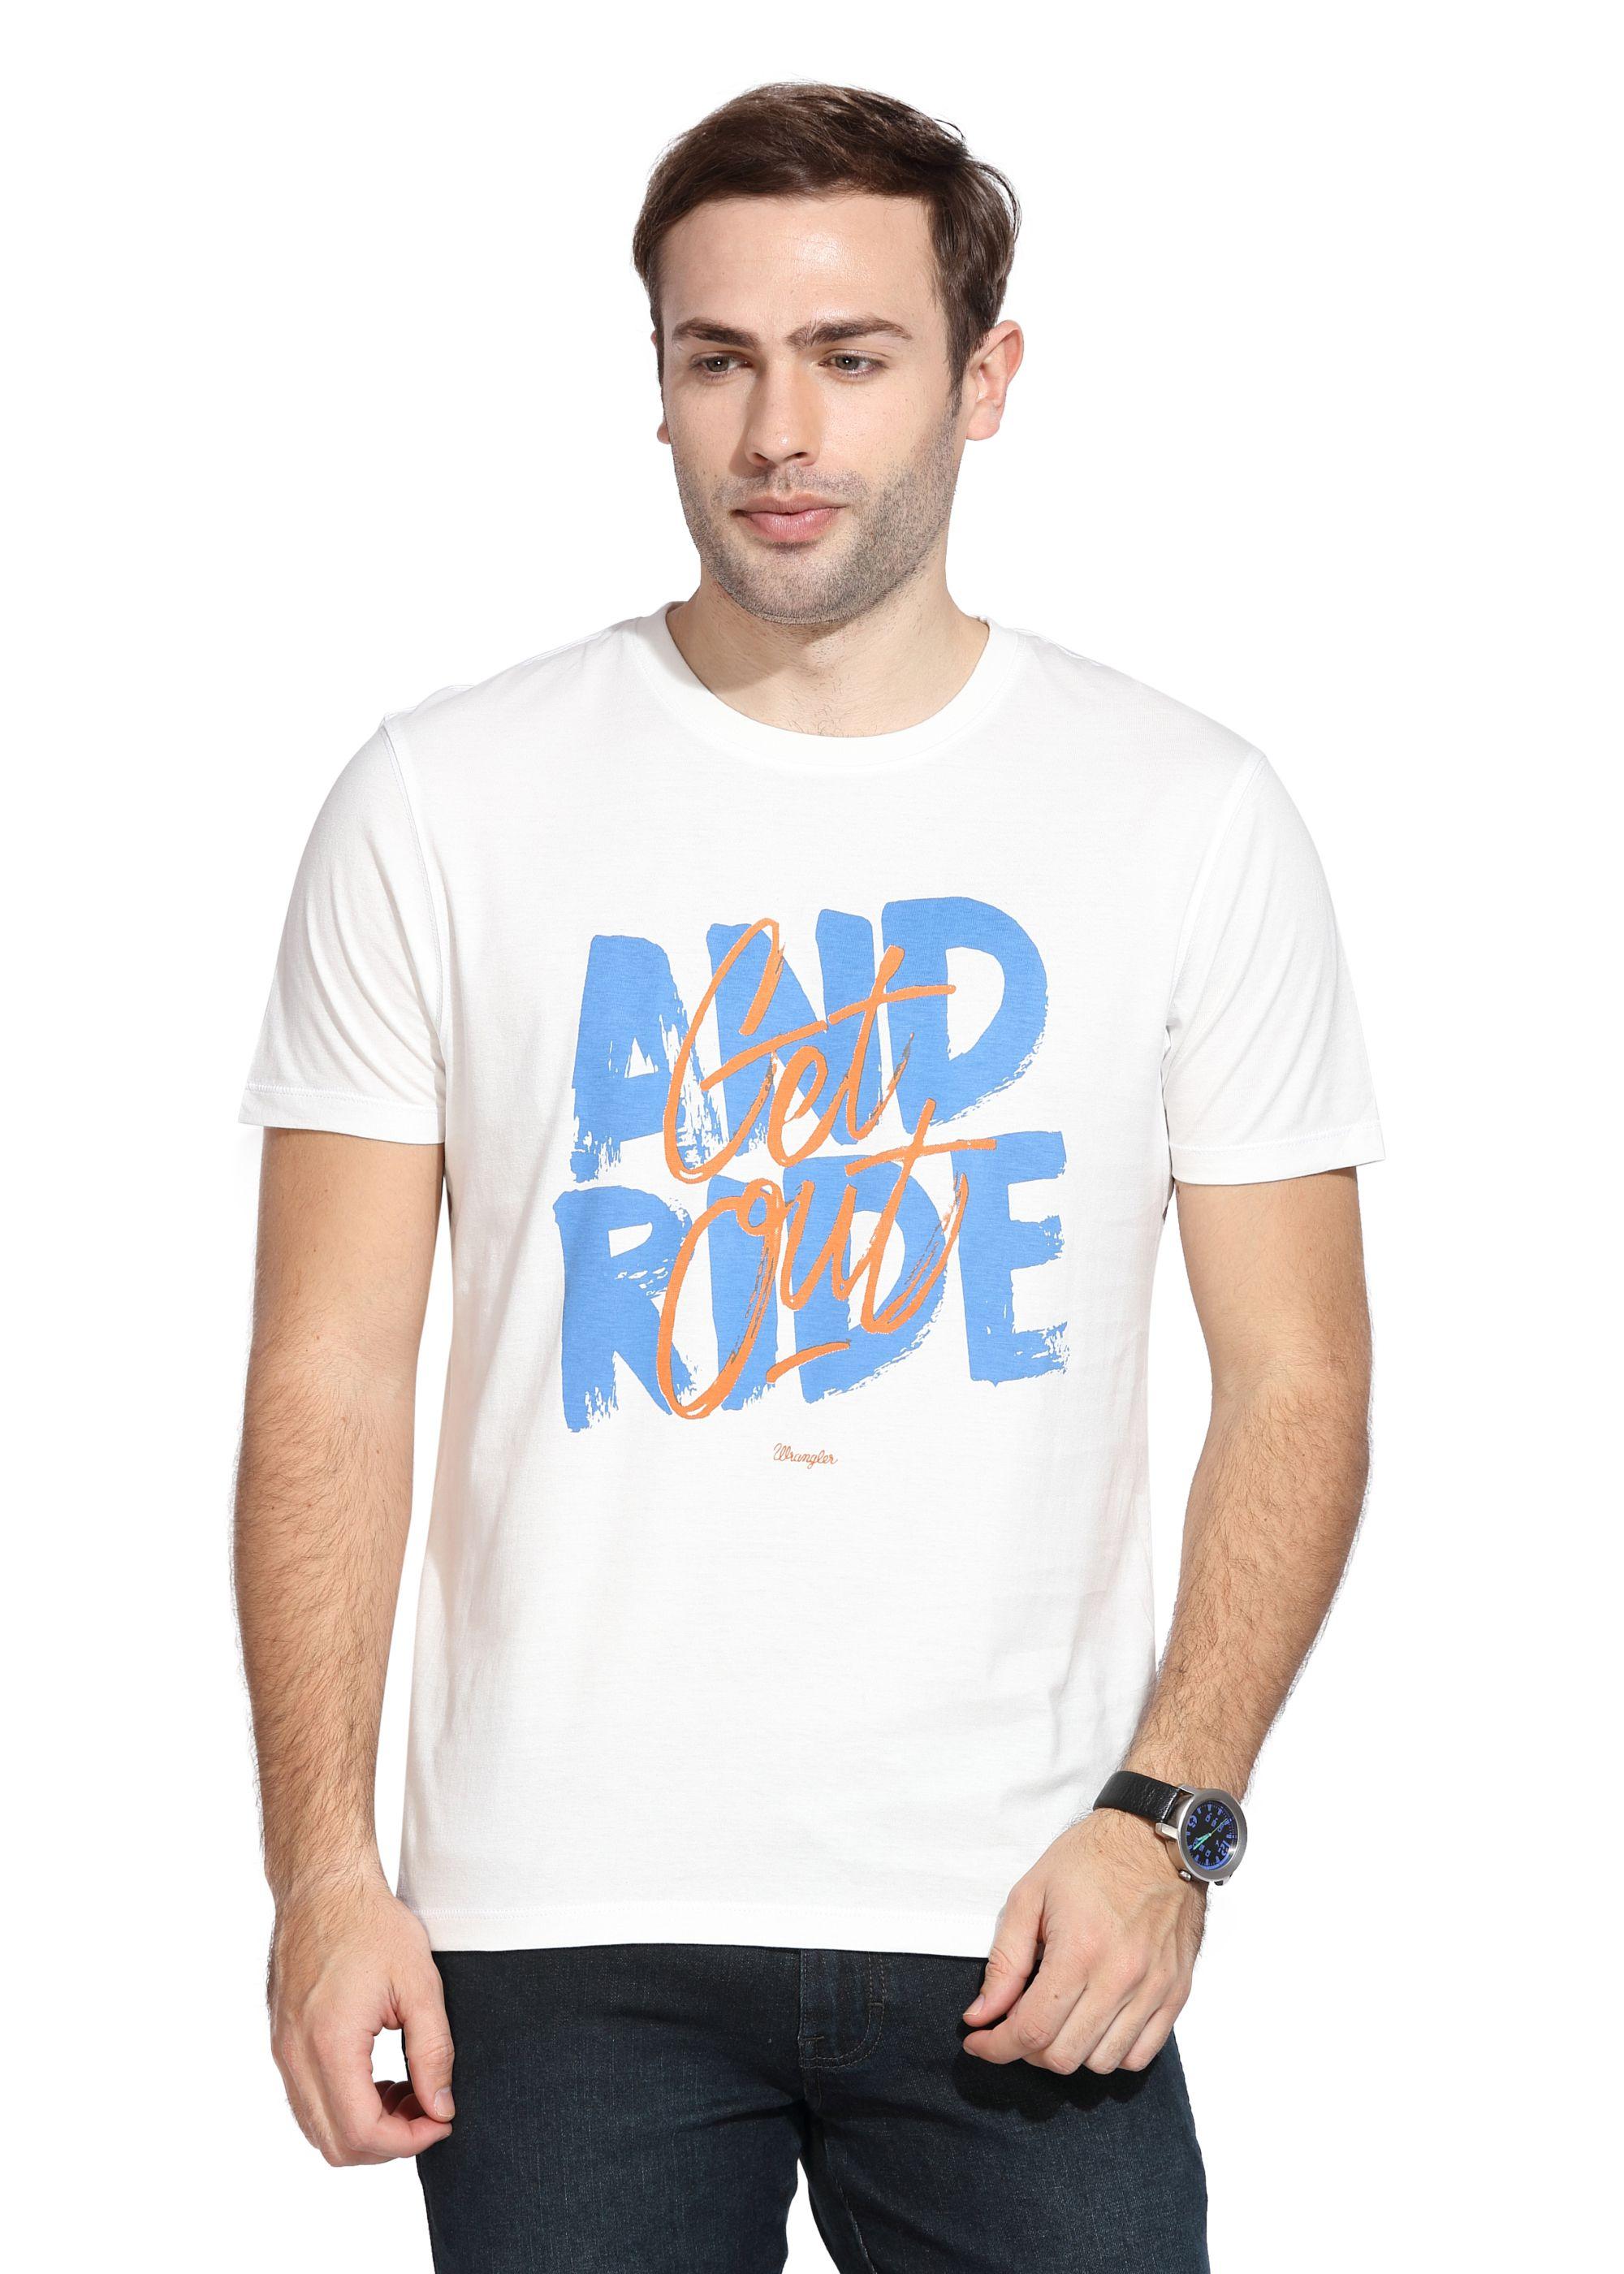 Wrangler White Round T-Shirt